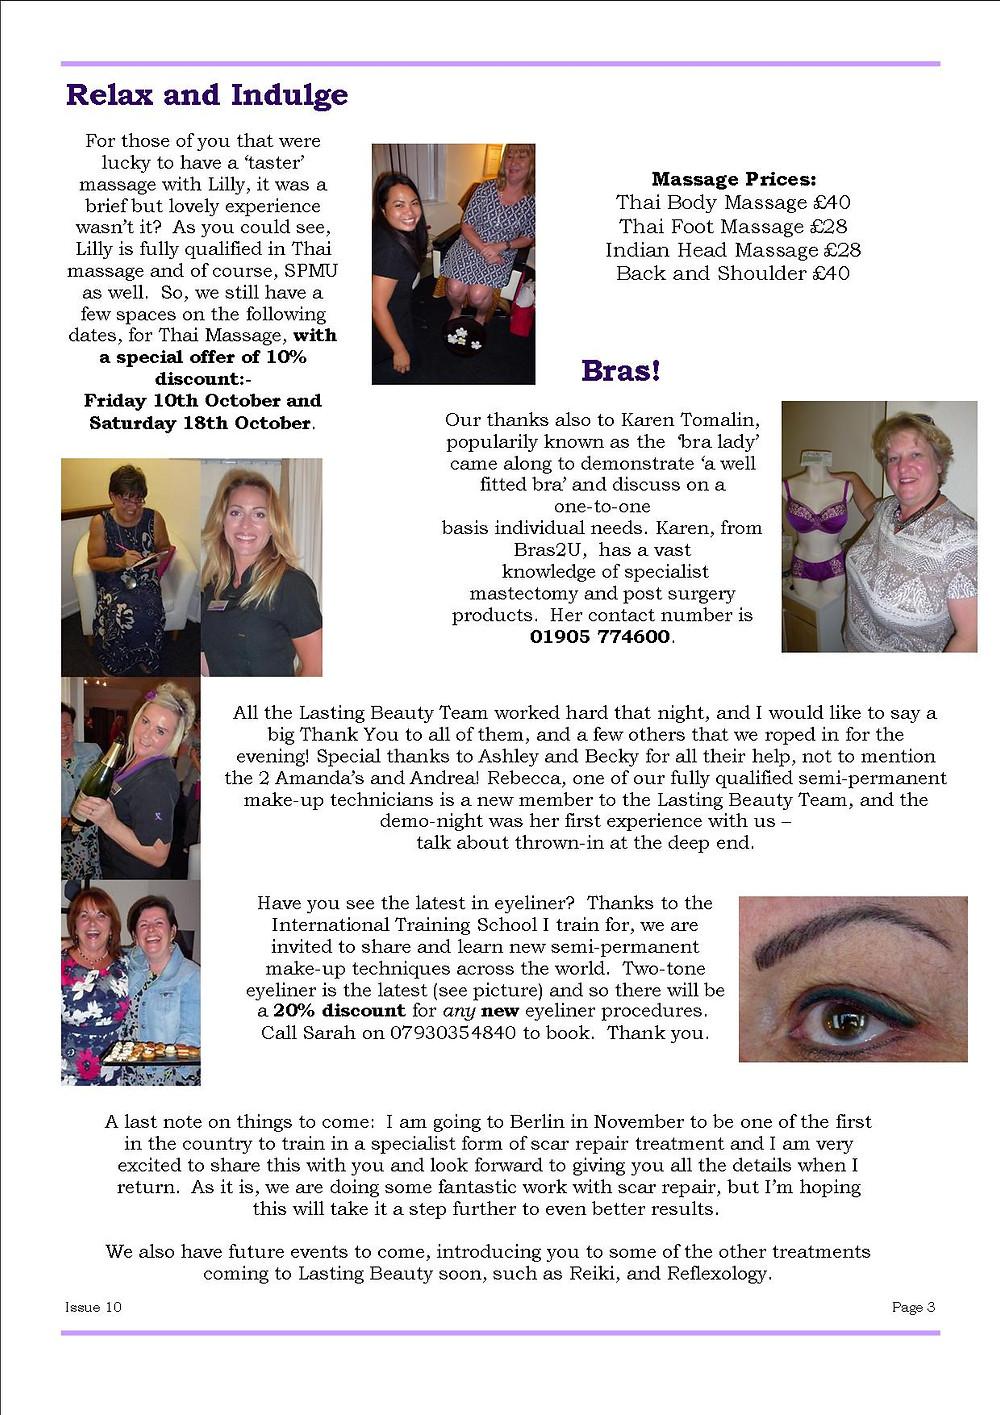 newsletter page 3.jpg